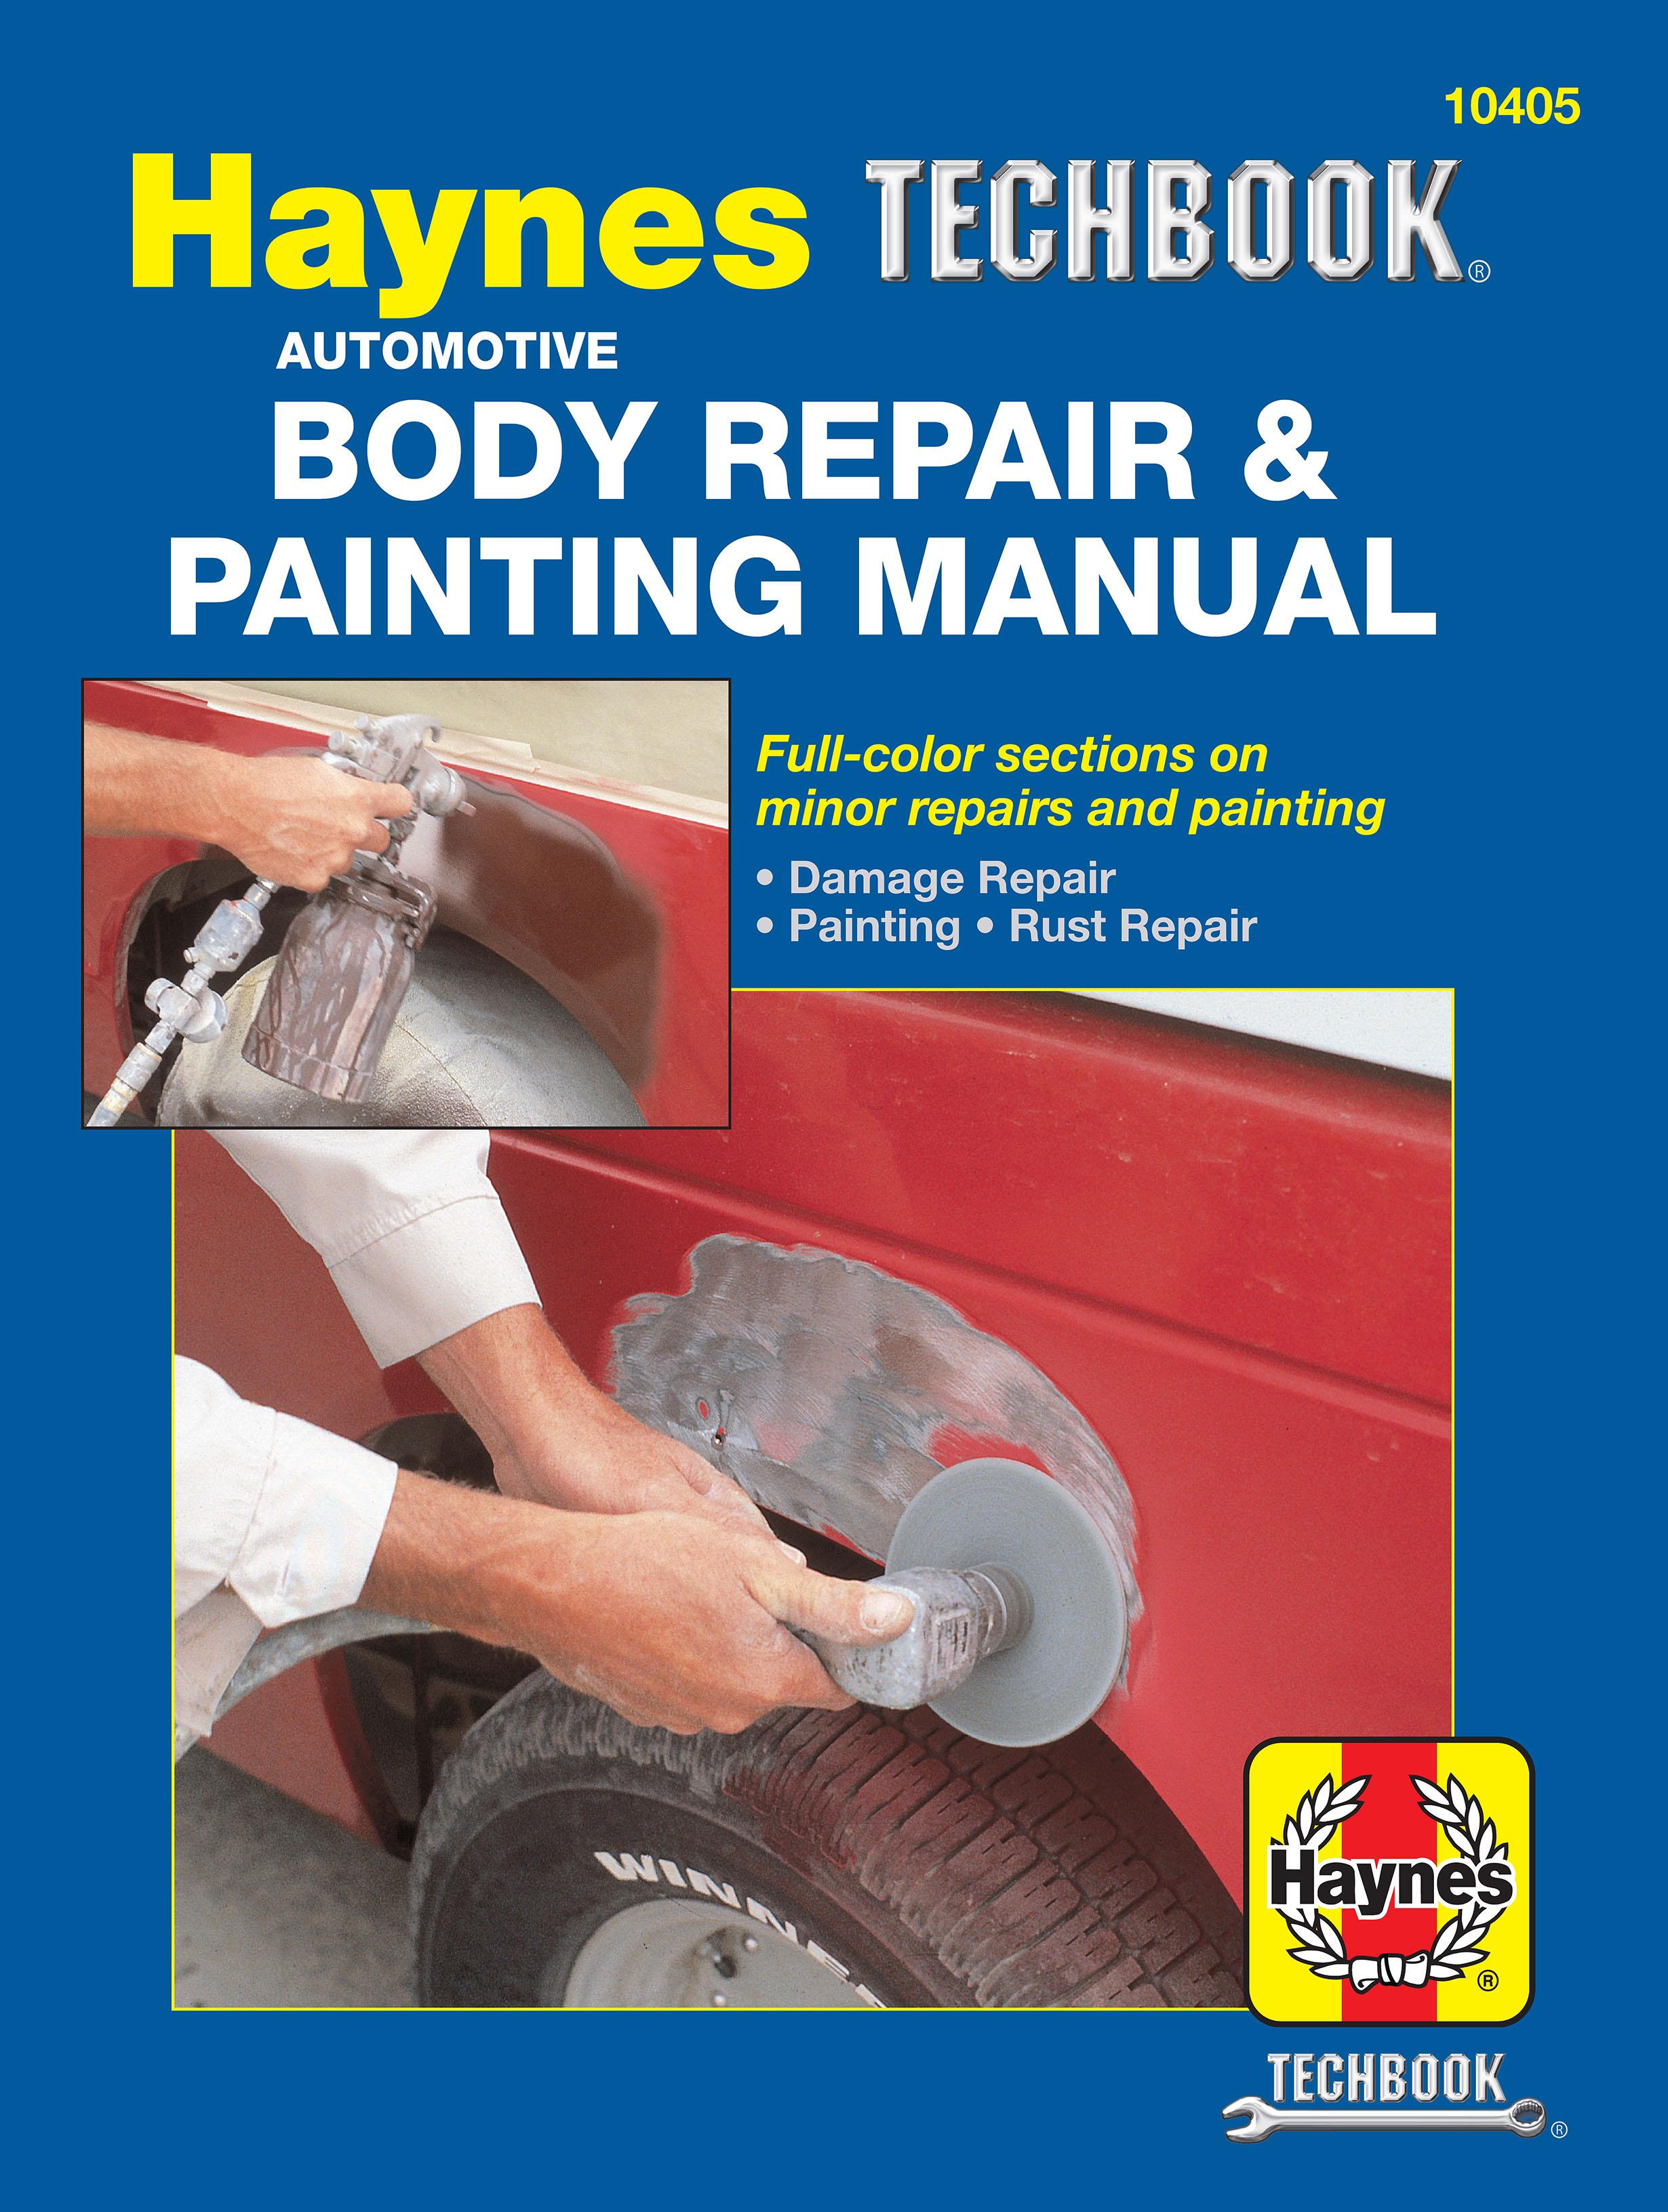 Automotive Body Repair & Painting Haynes Techbook (USA)